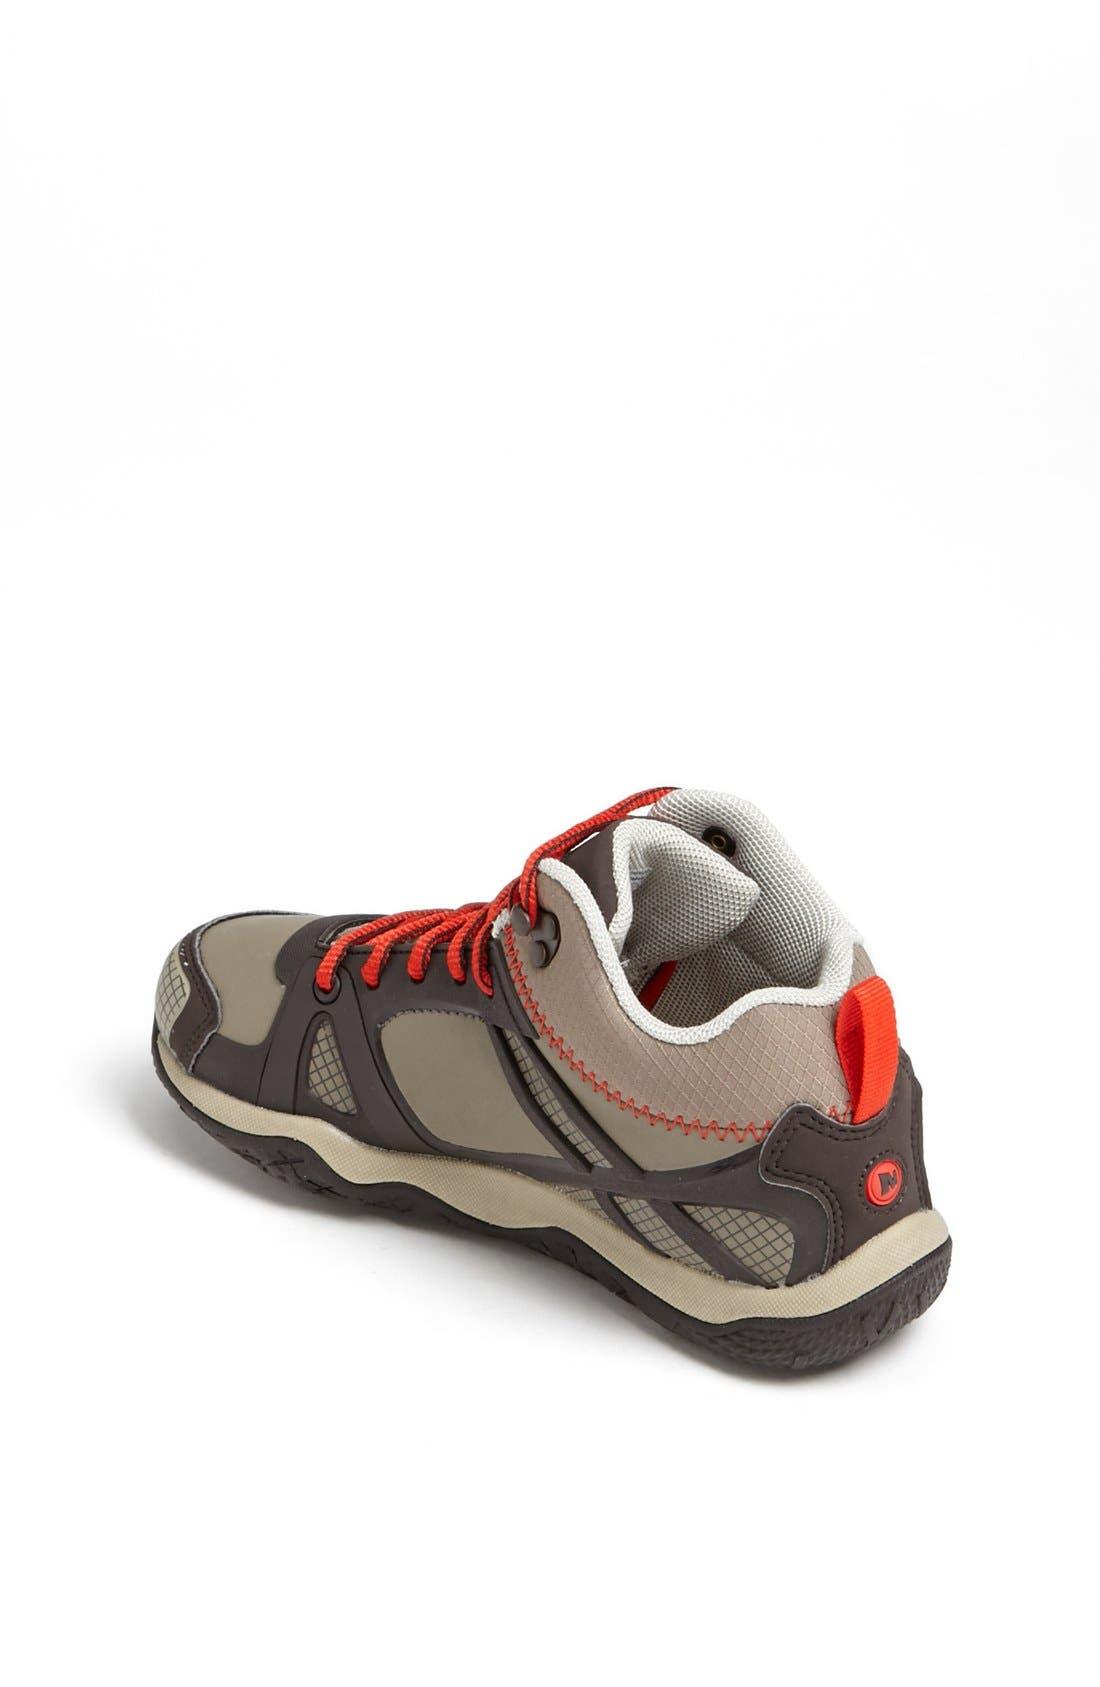 MERRELL,                             'Proterra' Mid High Waterproof Sneaker,                             Alternate thumbnail 2, color,                             201